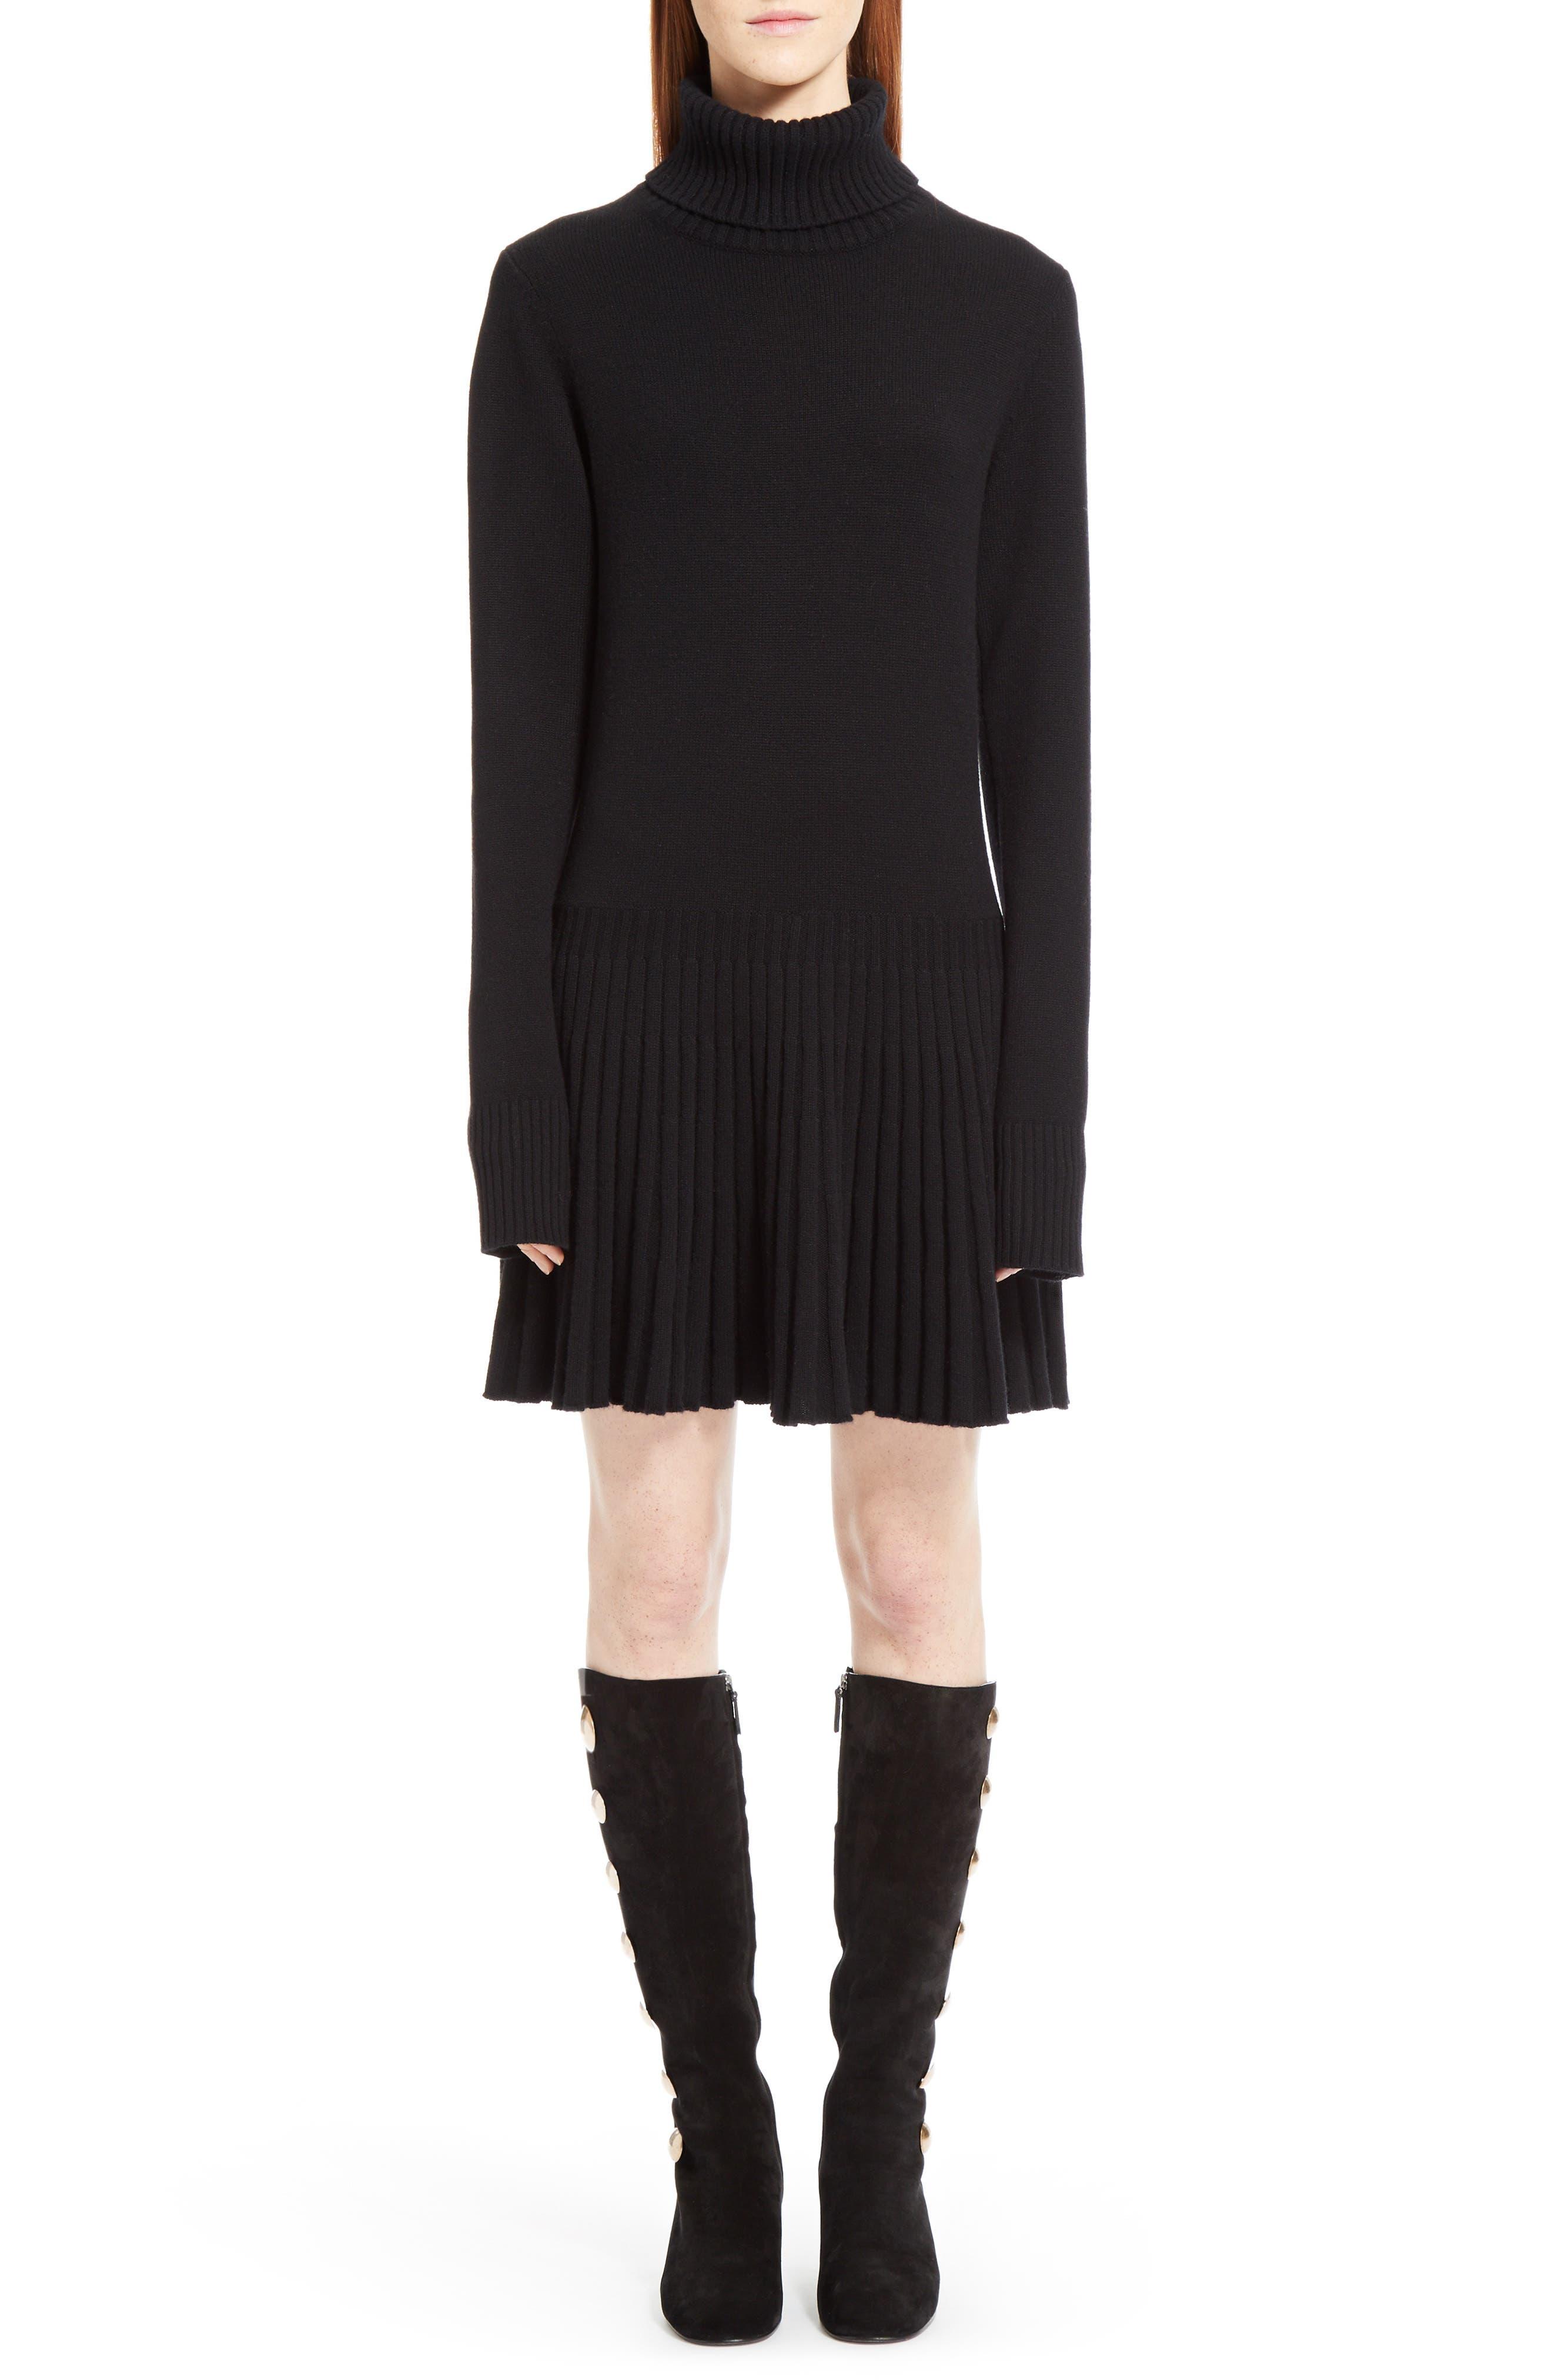 Main Image - Chloé Cashmere Pleated Turtleneck Dress